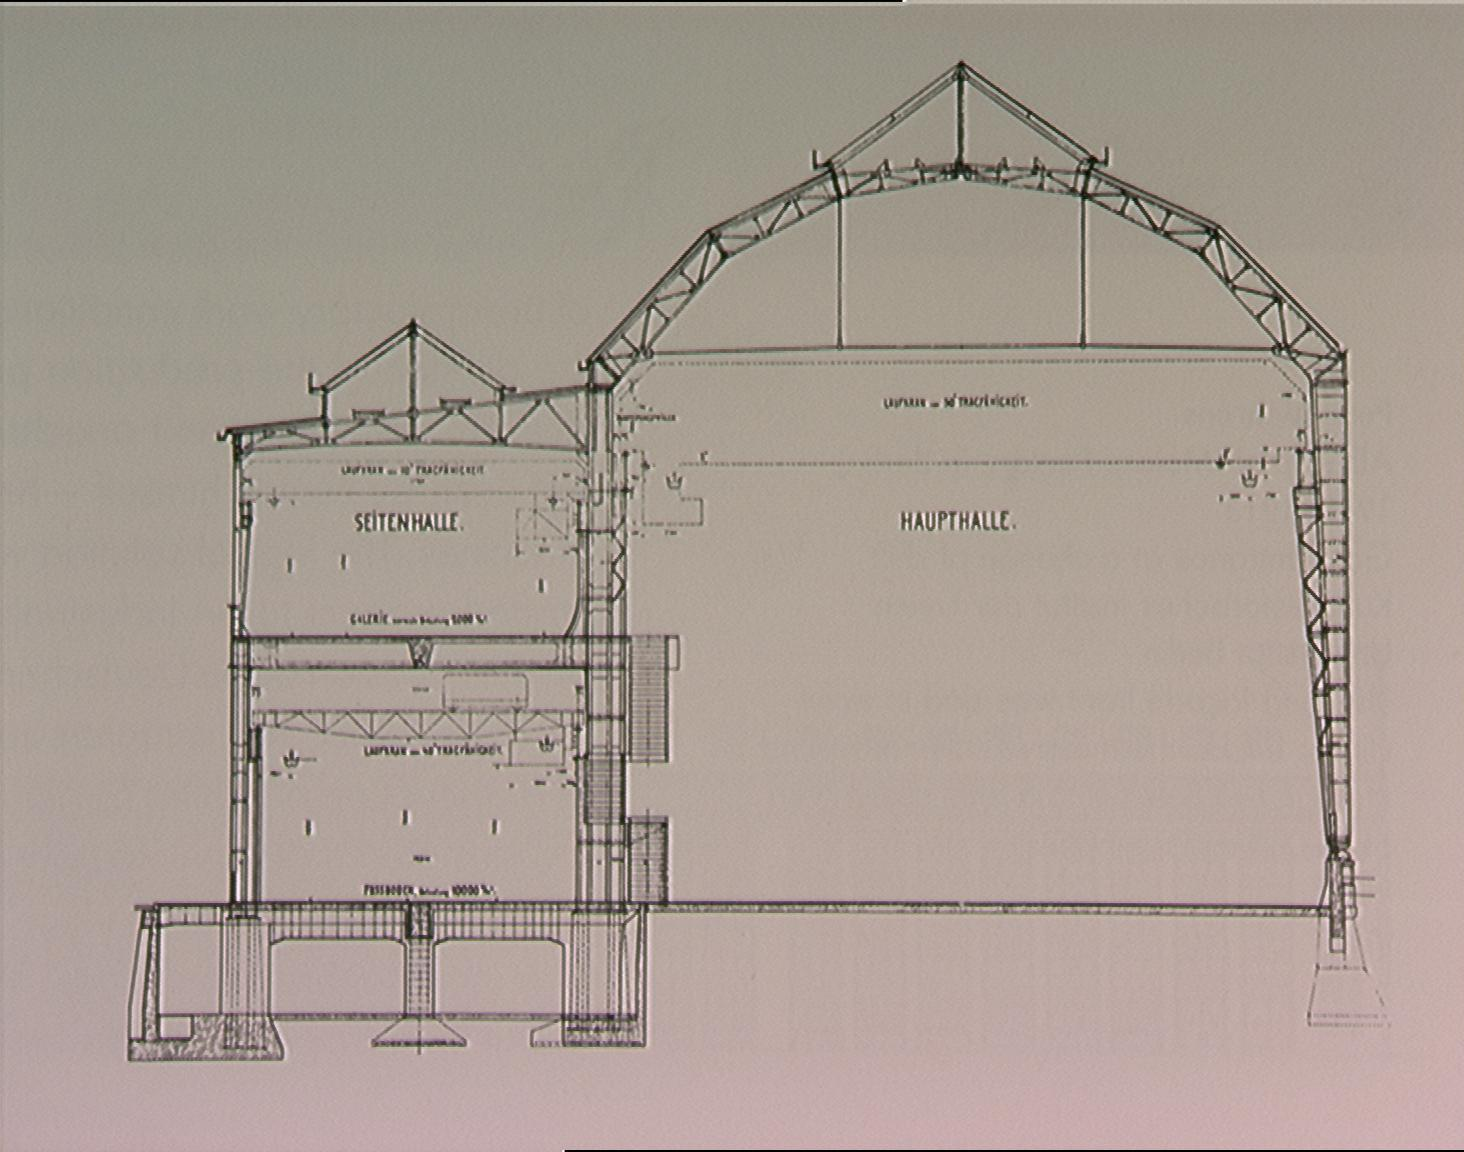 Behrens aeg turbine hall images for Peter behrens aeg turbine factory